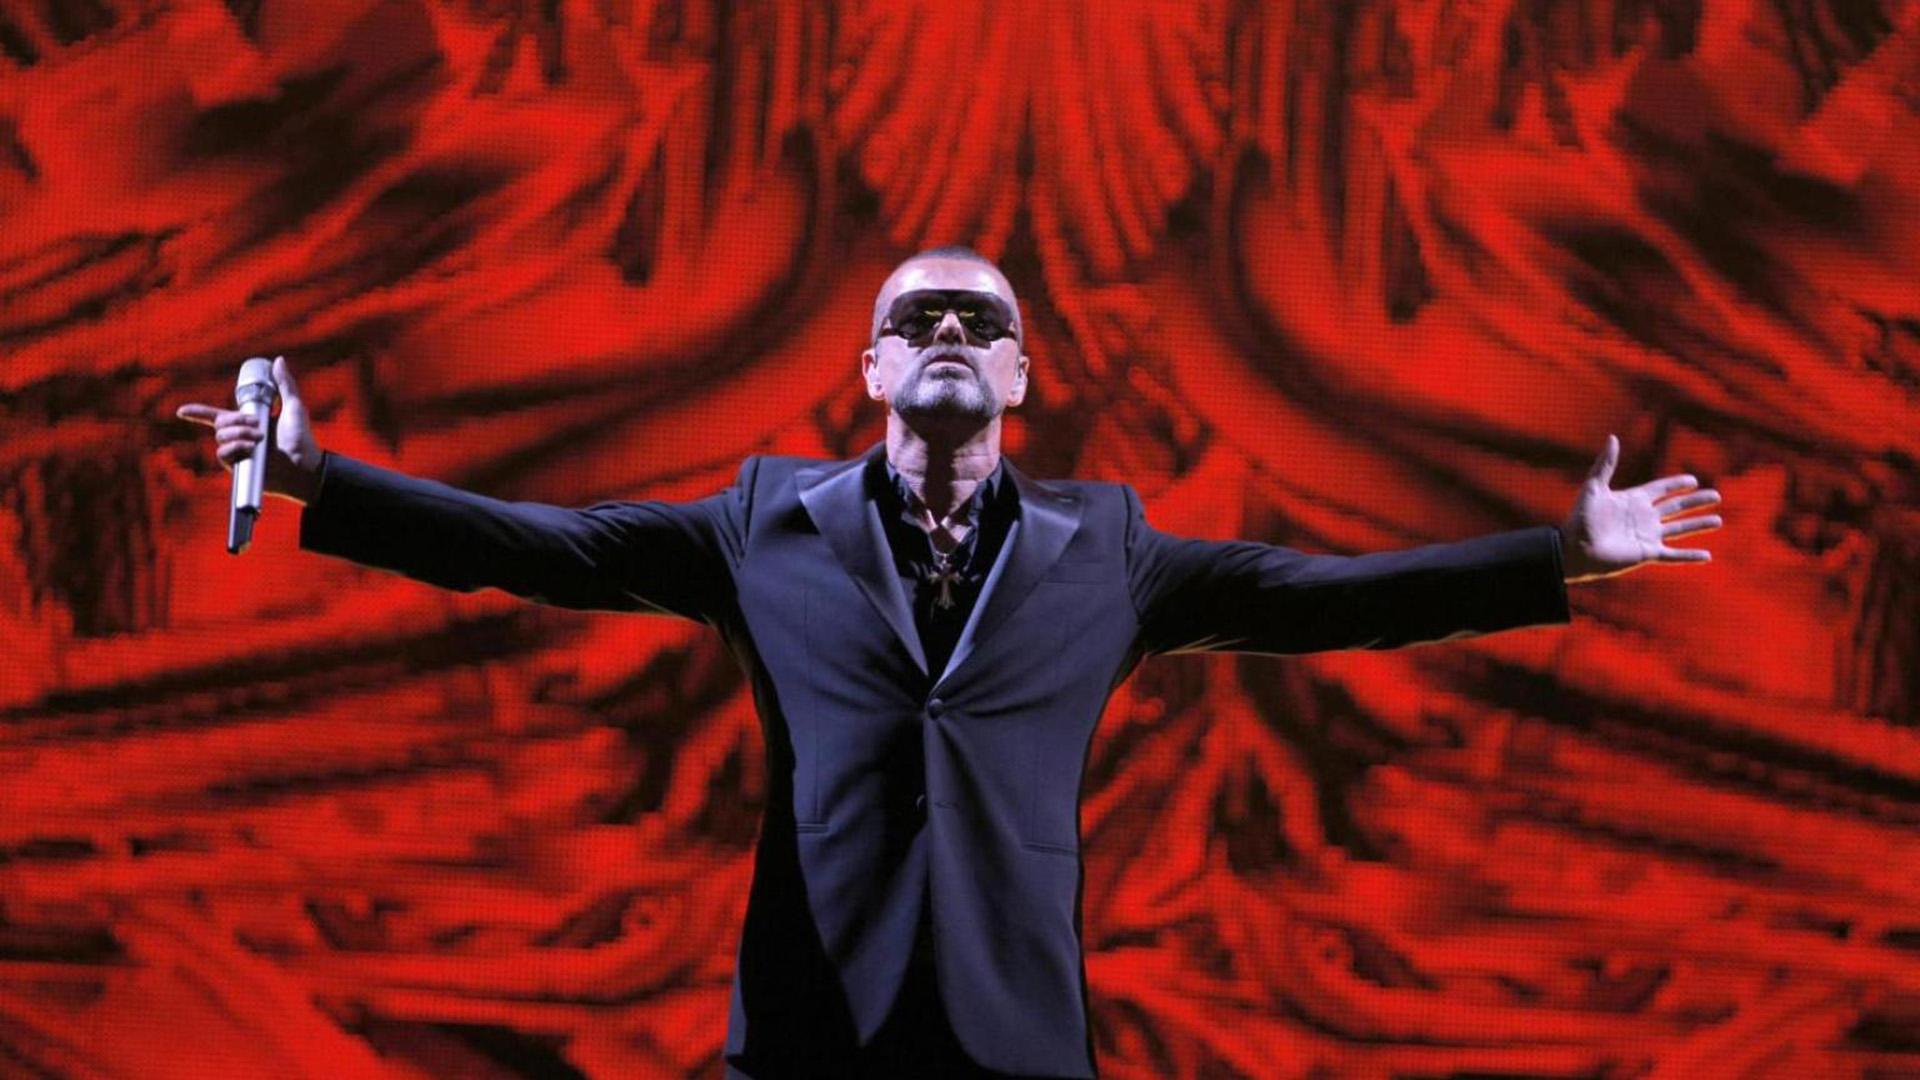 Recital a beneficio en el Palais Garnier Opera de París (NA)